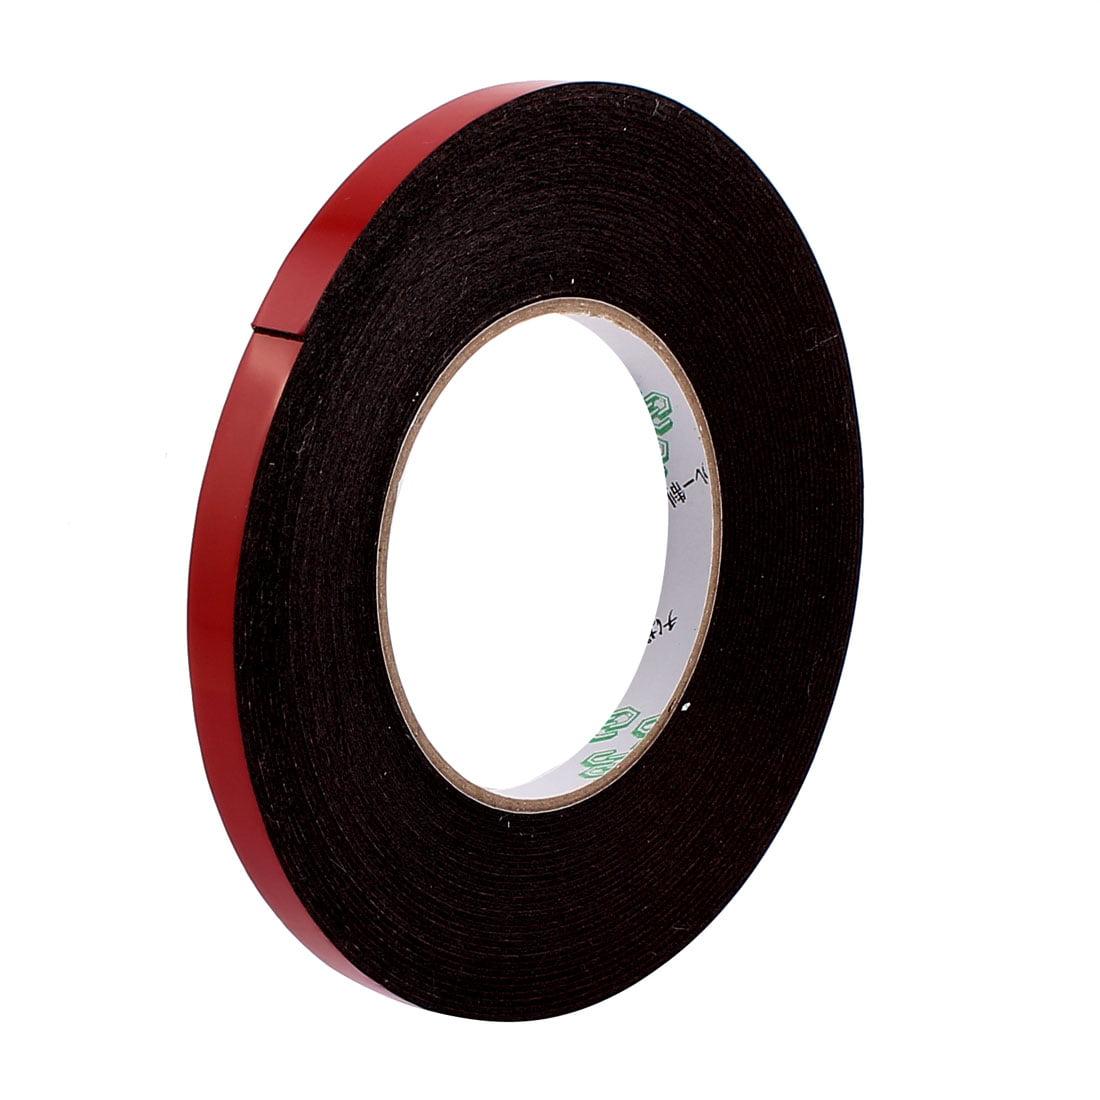 10mmx1mm Double Sided Sponge Tape Adhesive Sticker Foam Glue Strip Sealing 33Ft